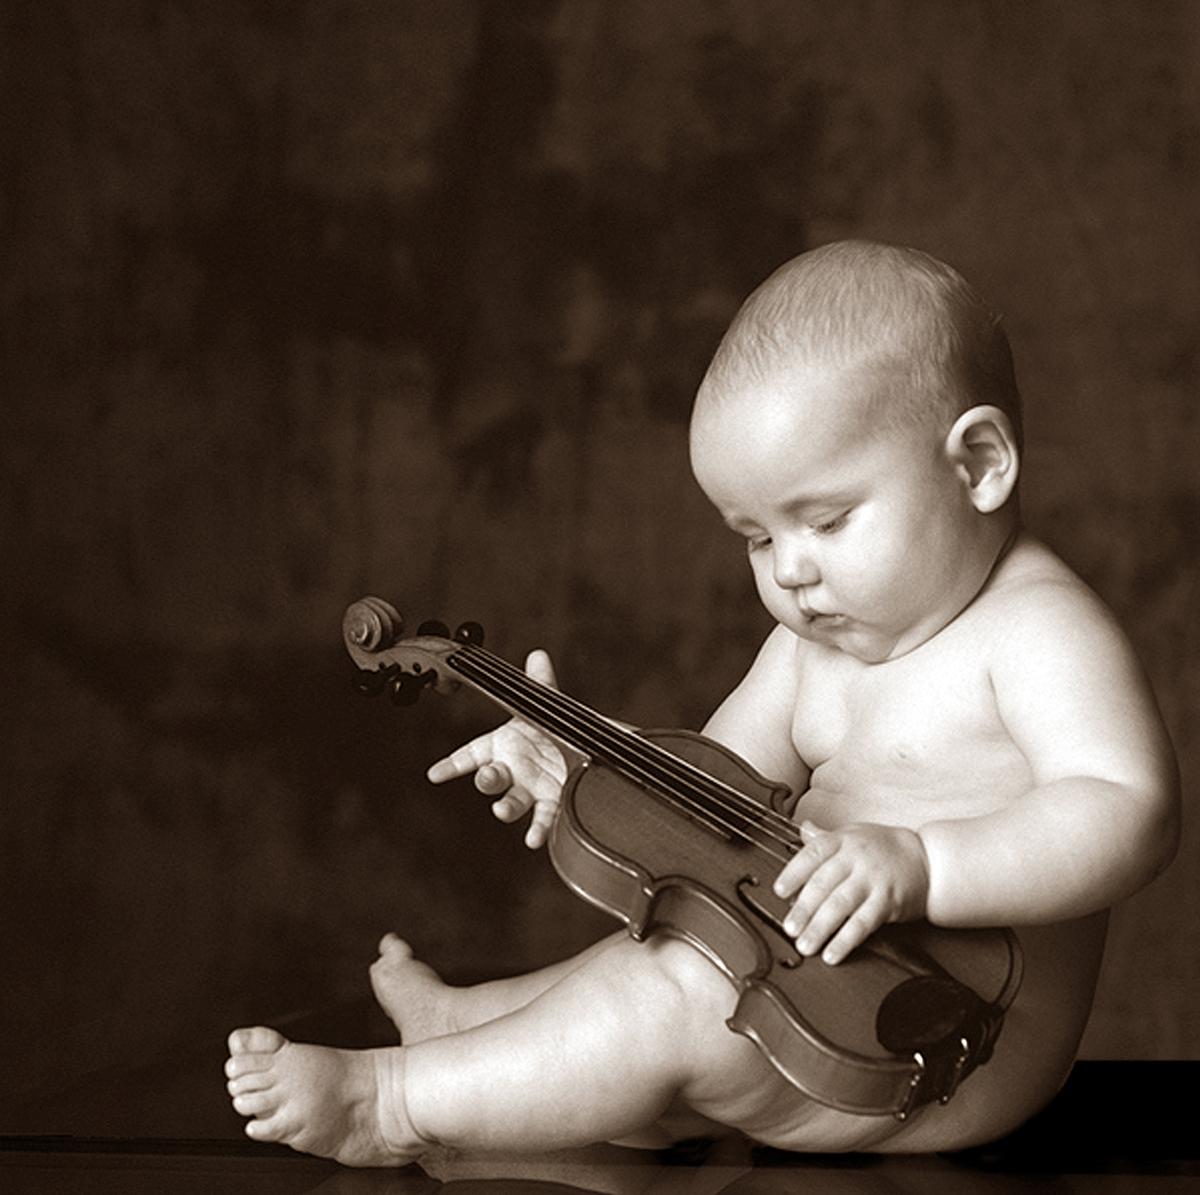 Baby and violin